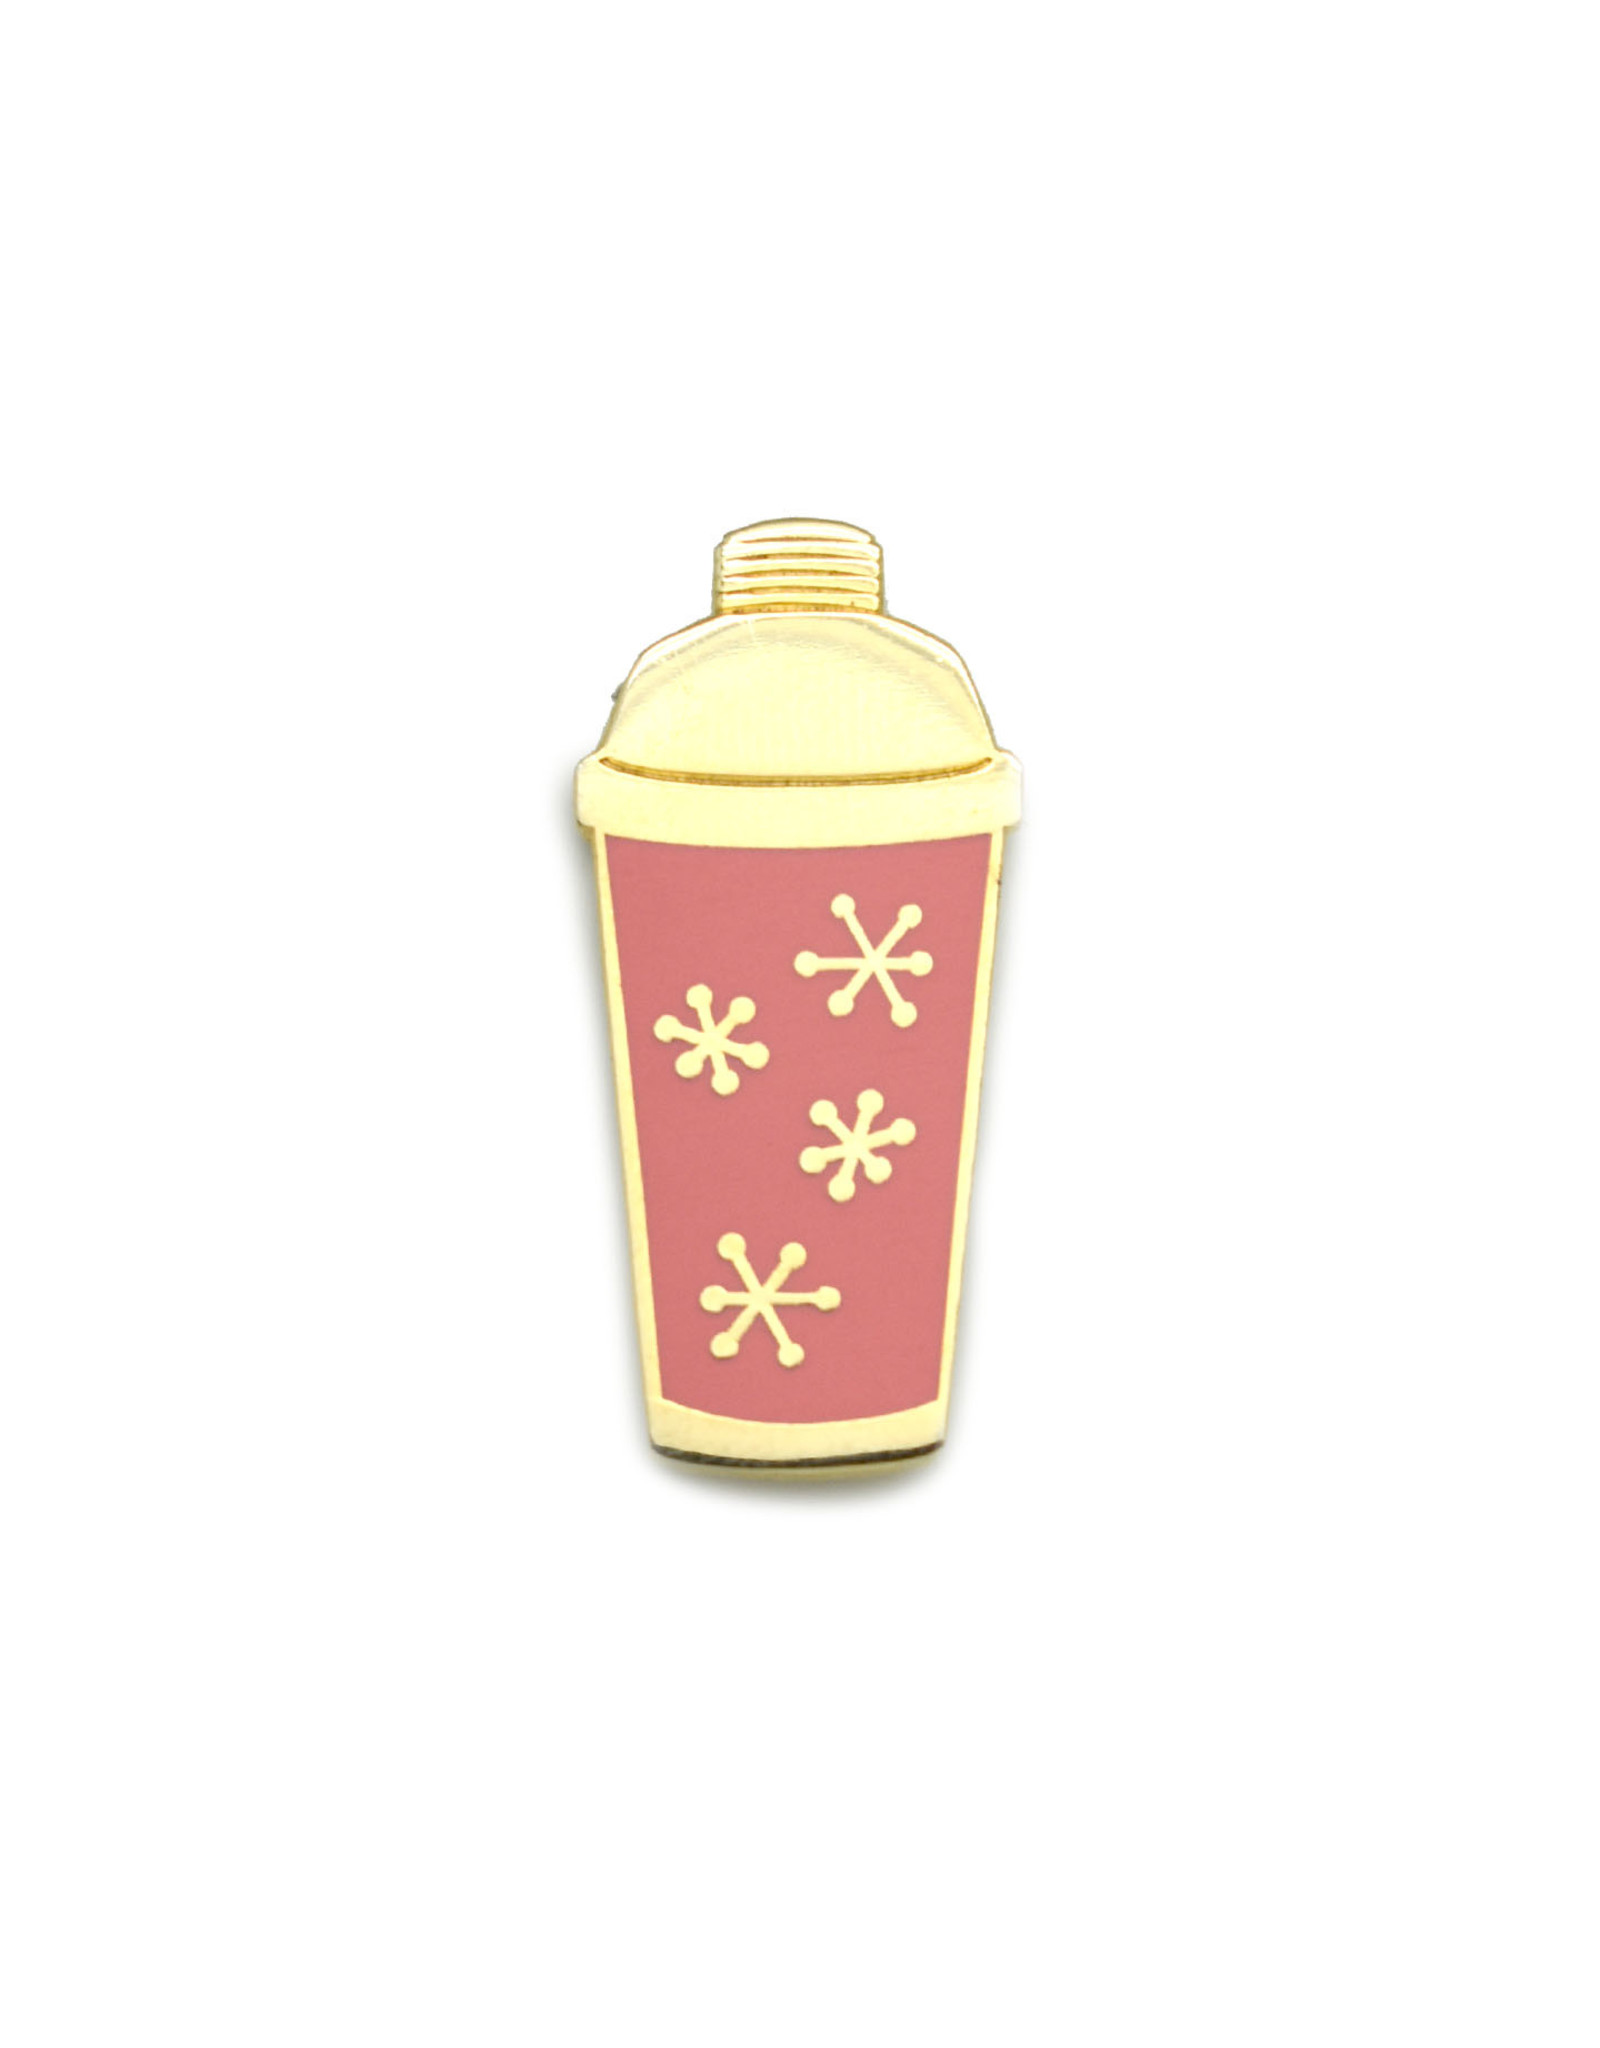 Cocktail Shaker Pin - Pink & Gold